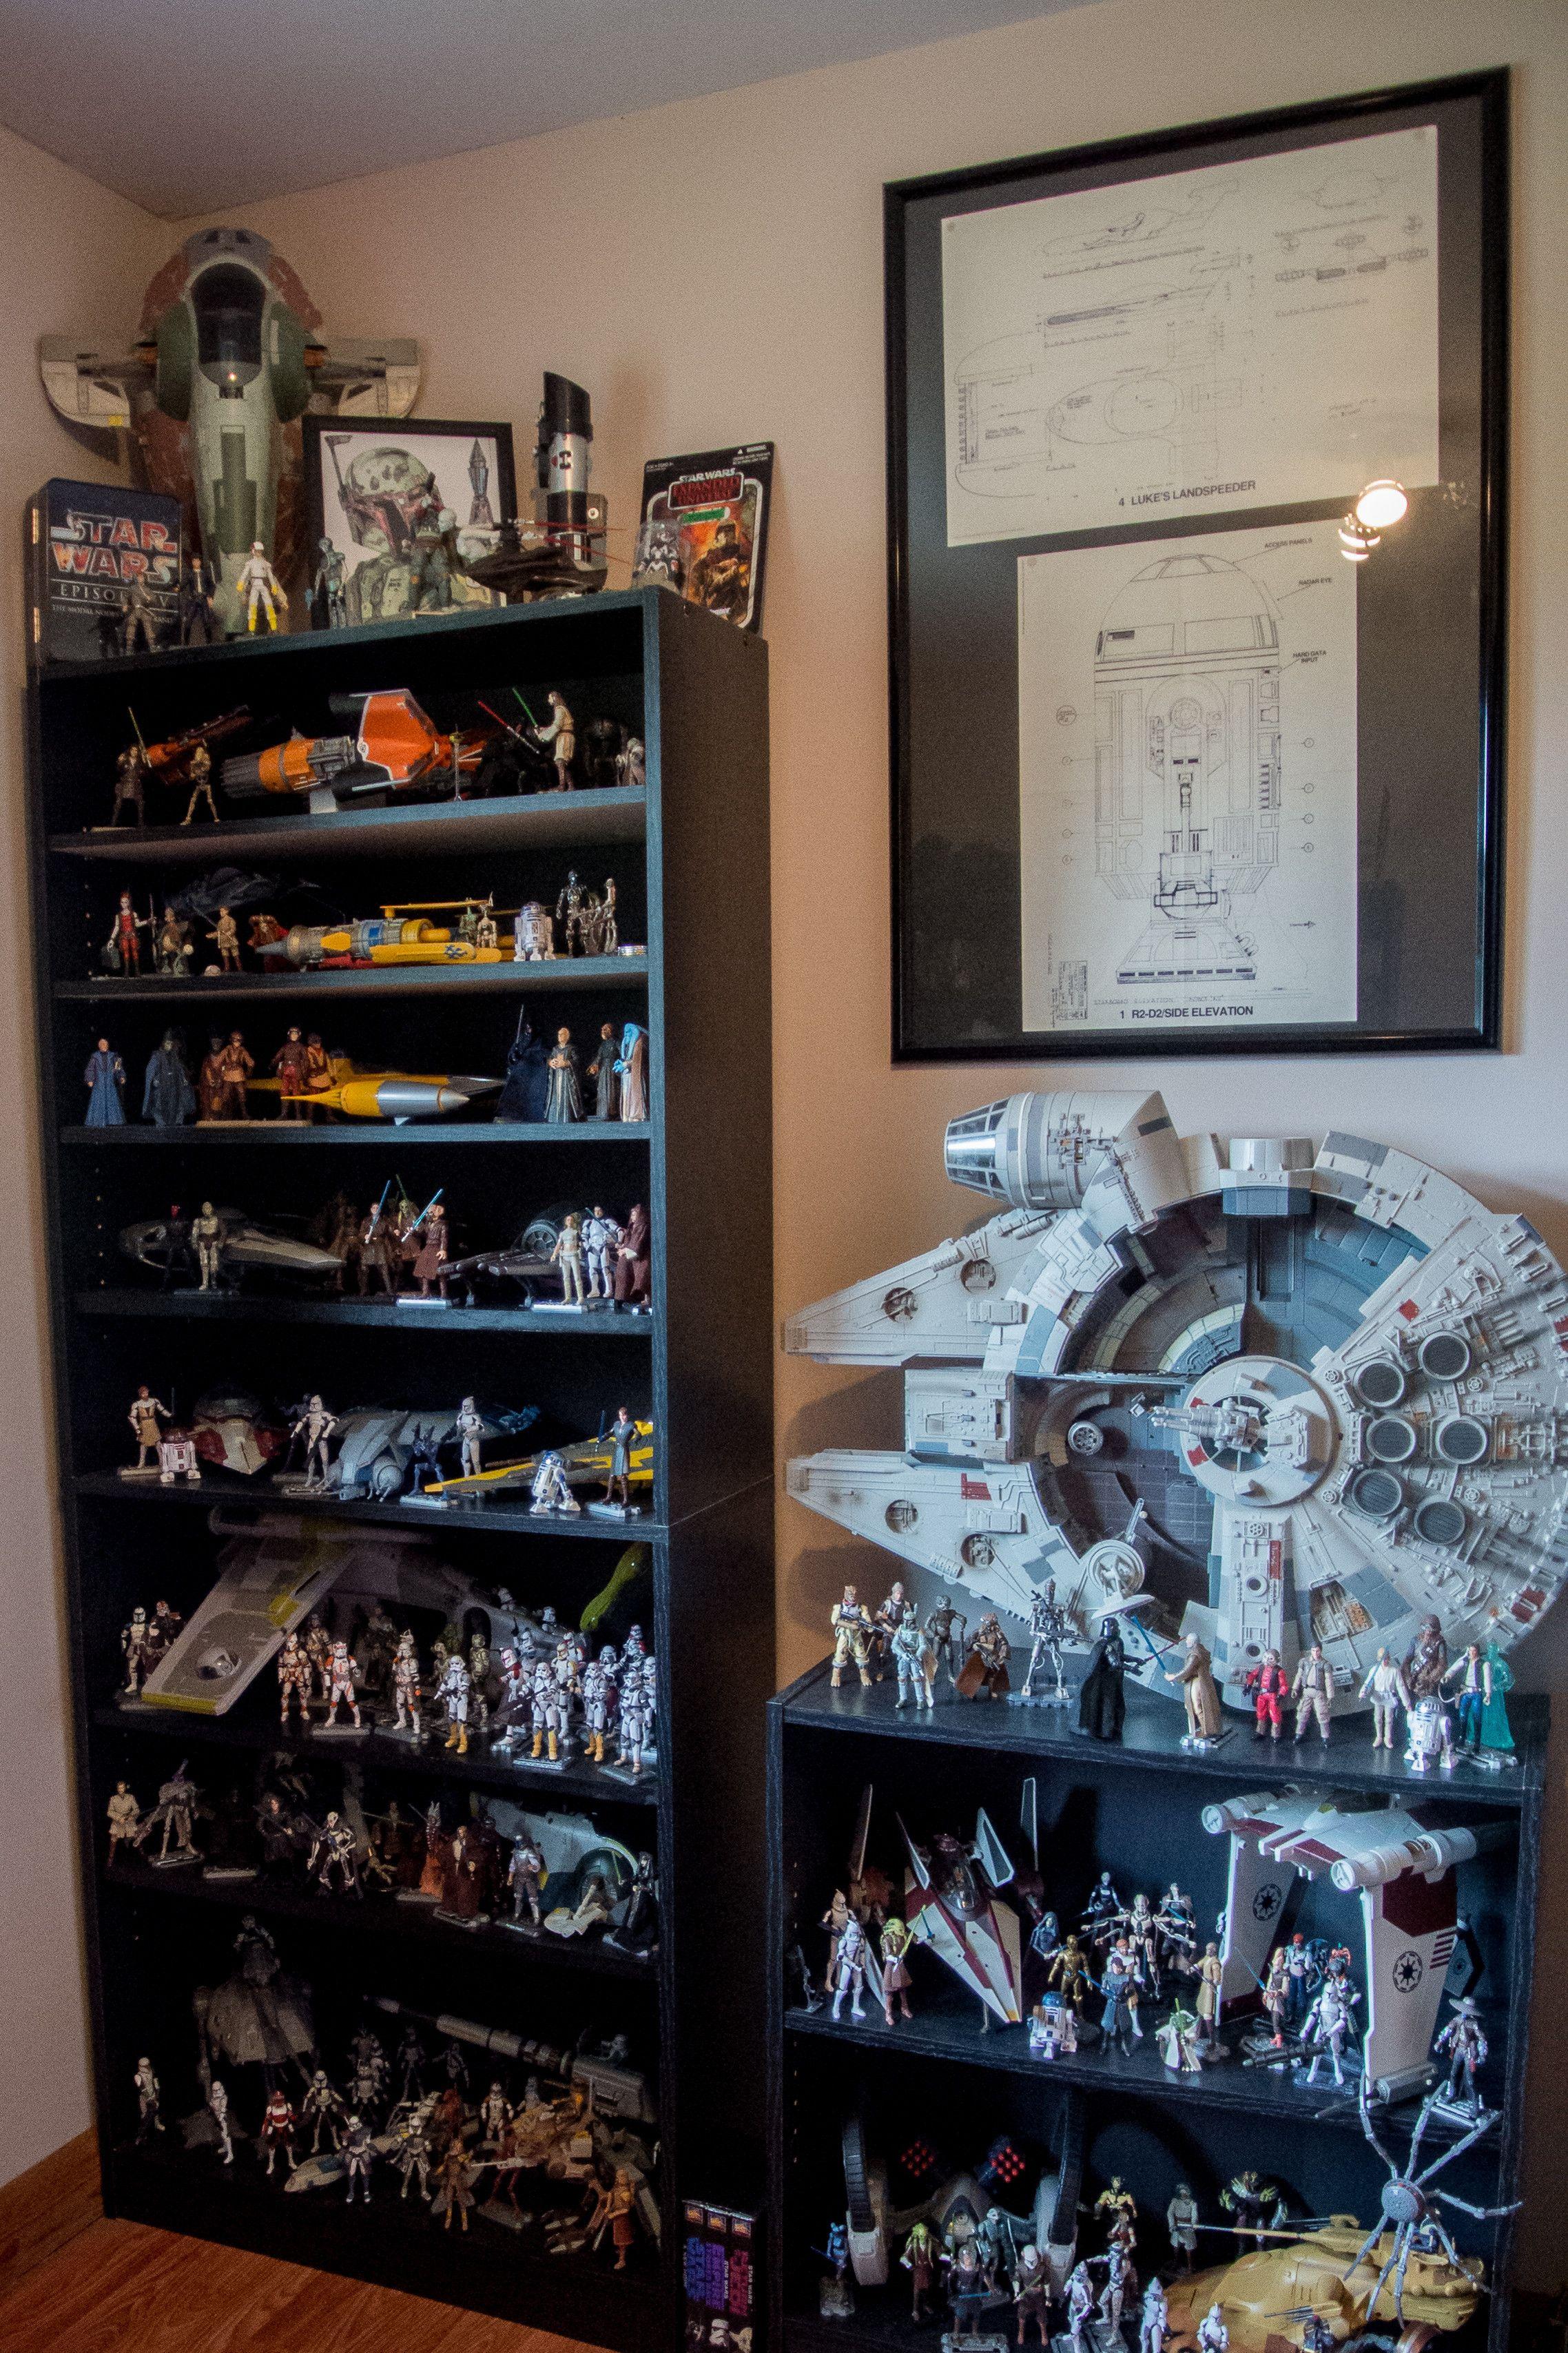 80 Toy Action Figure Shelves - 69800f87c77bf070edca2c2e68d6a9b3_Must see 80 Toy Action Figure Shelves - 69800f87c77bf070edca2c2e68d6a9b3  Pictures_974446.jpg